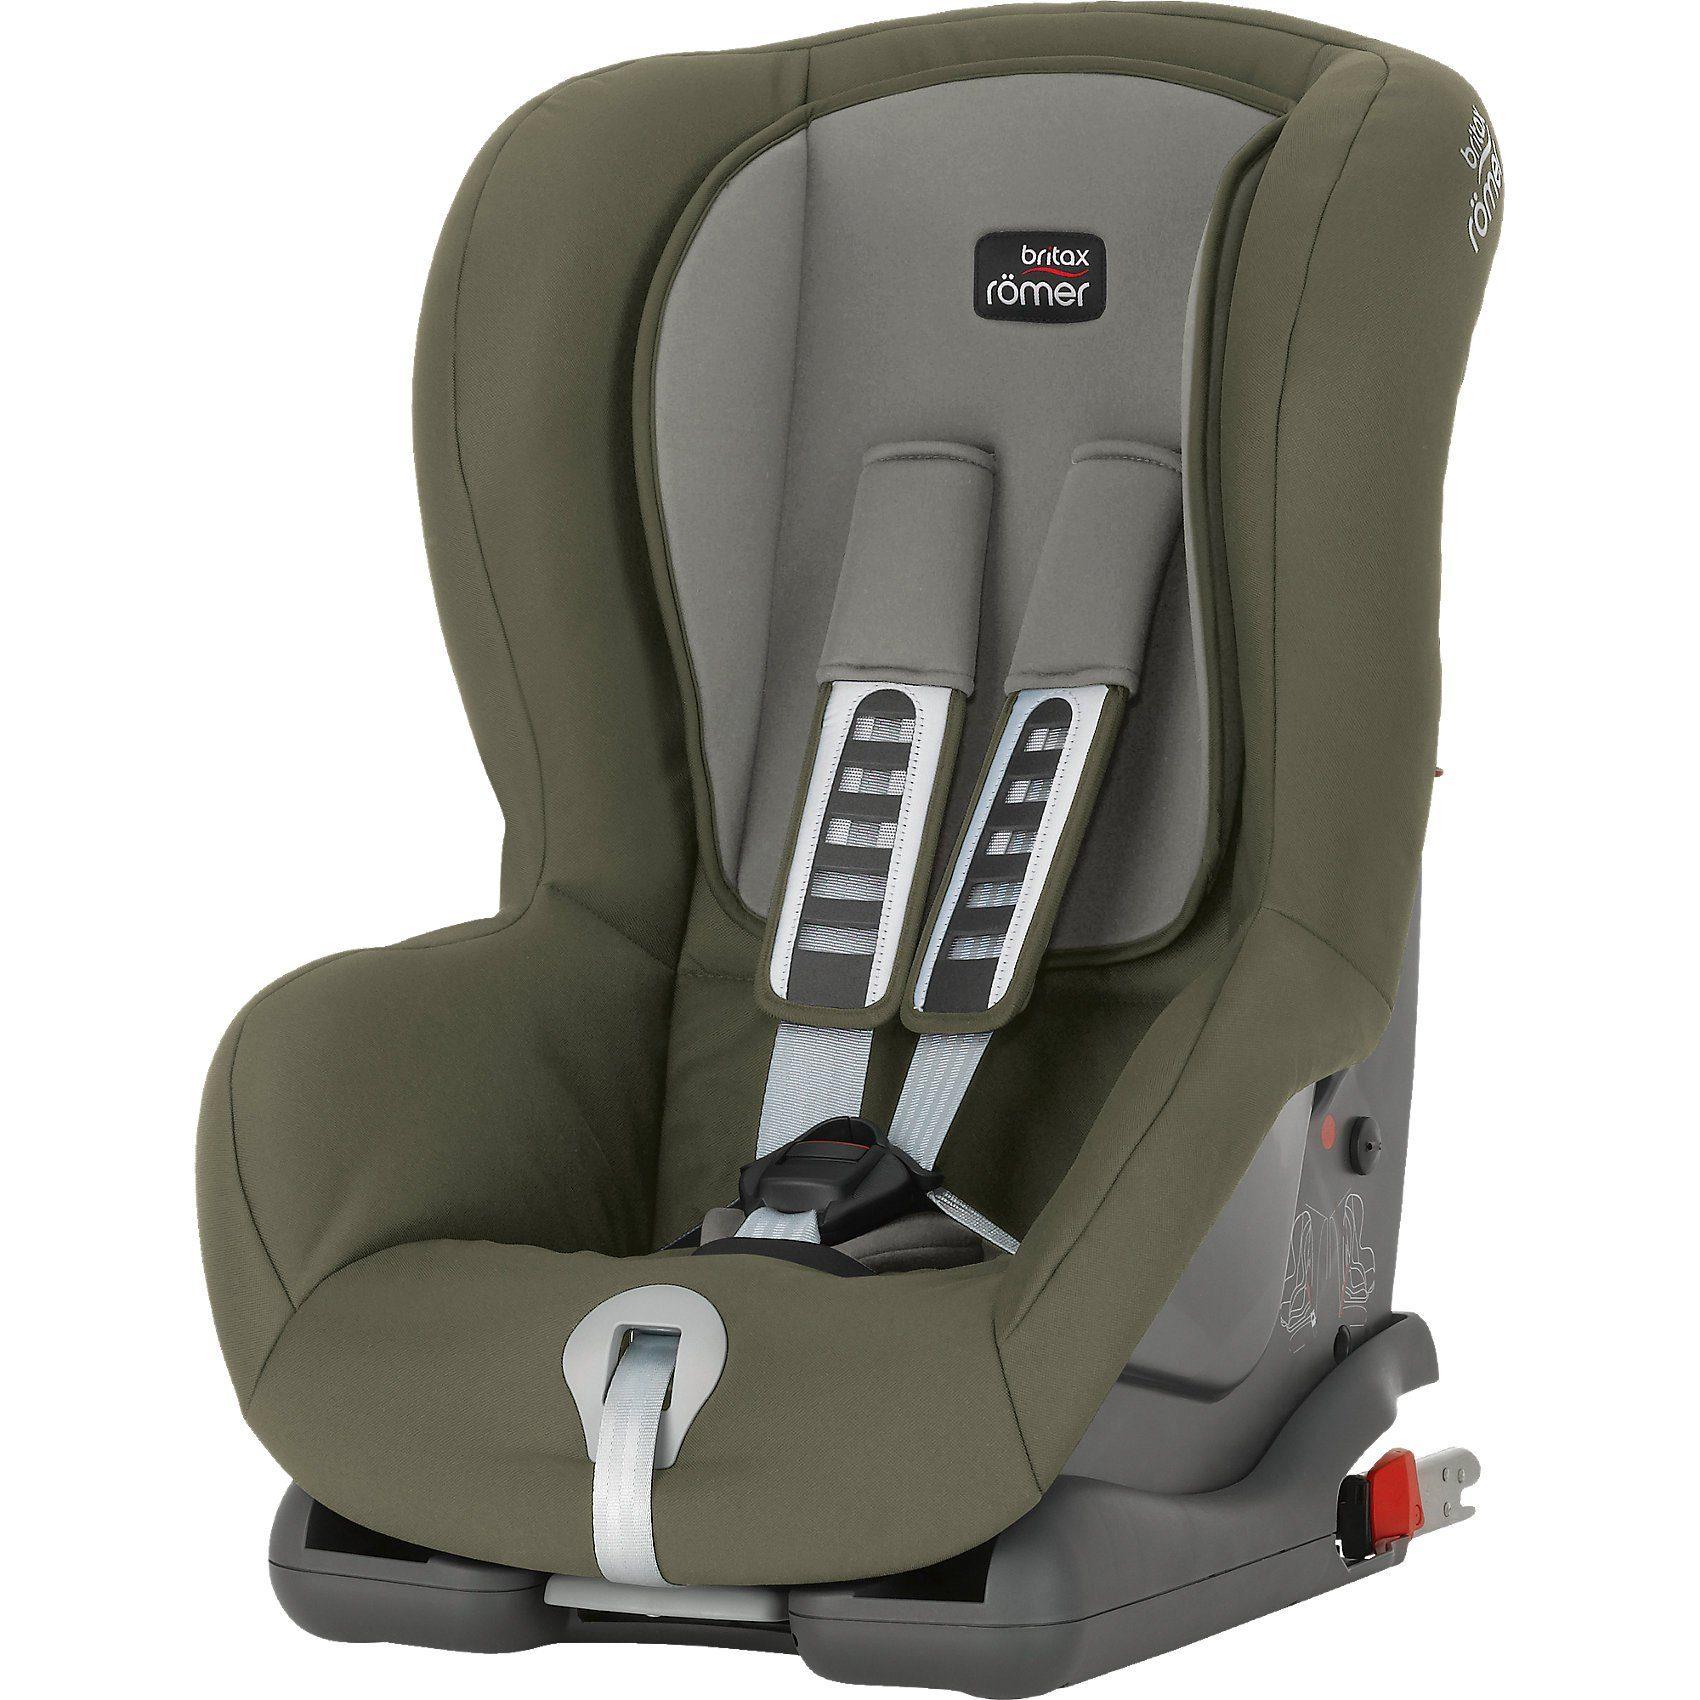 Britax Römer Auto-Kindersitz Duo Plus, Olive Green, 2017